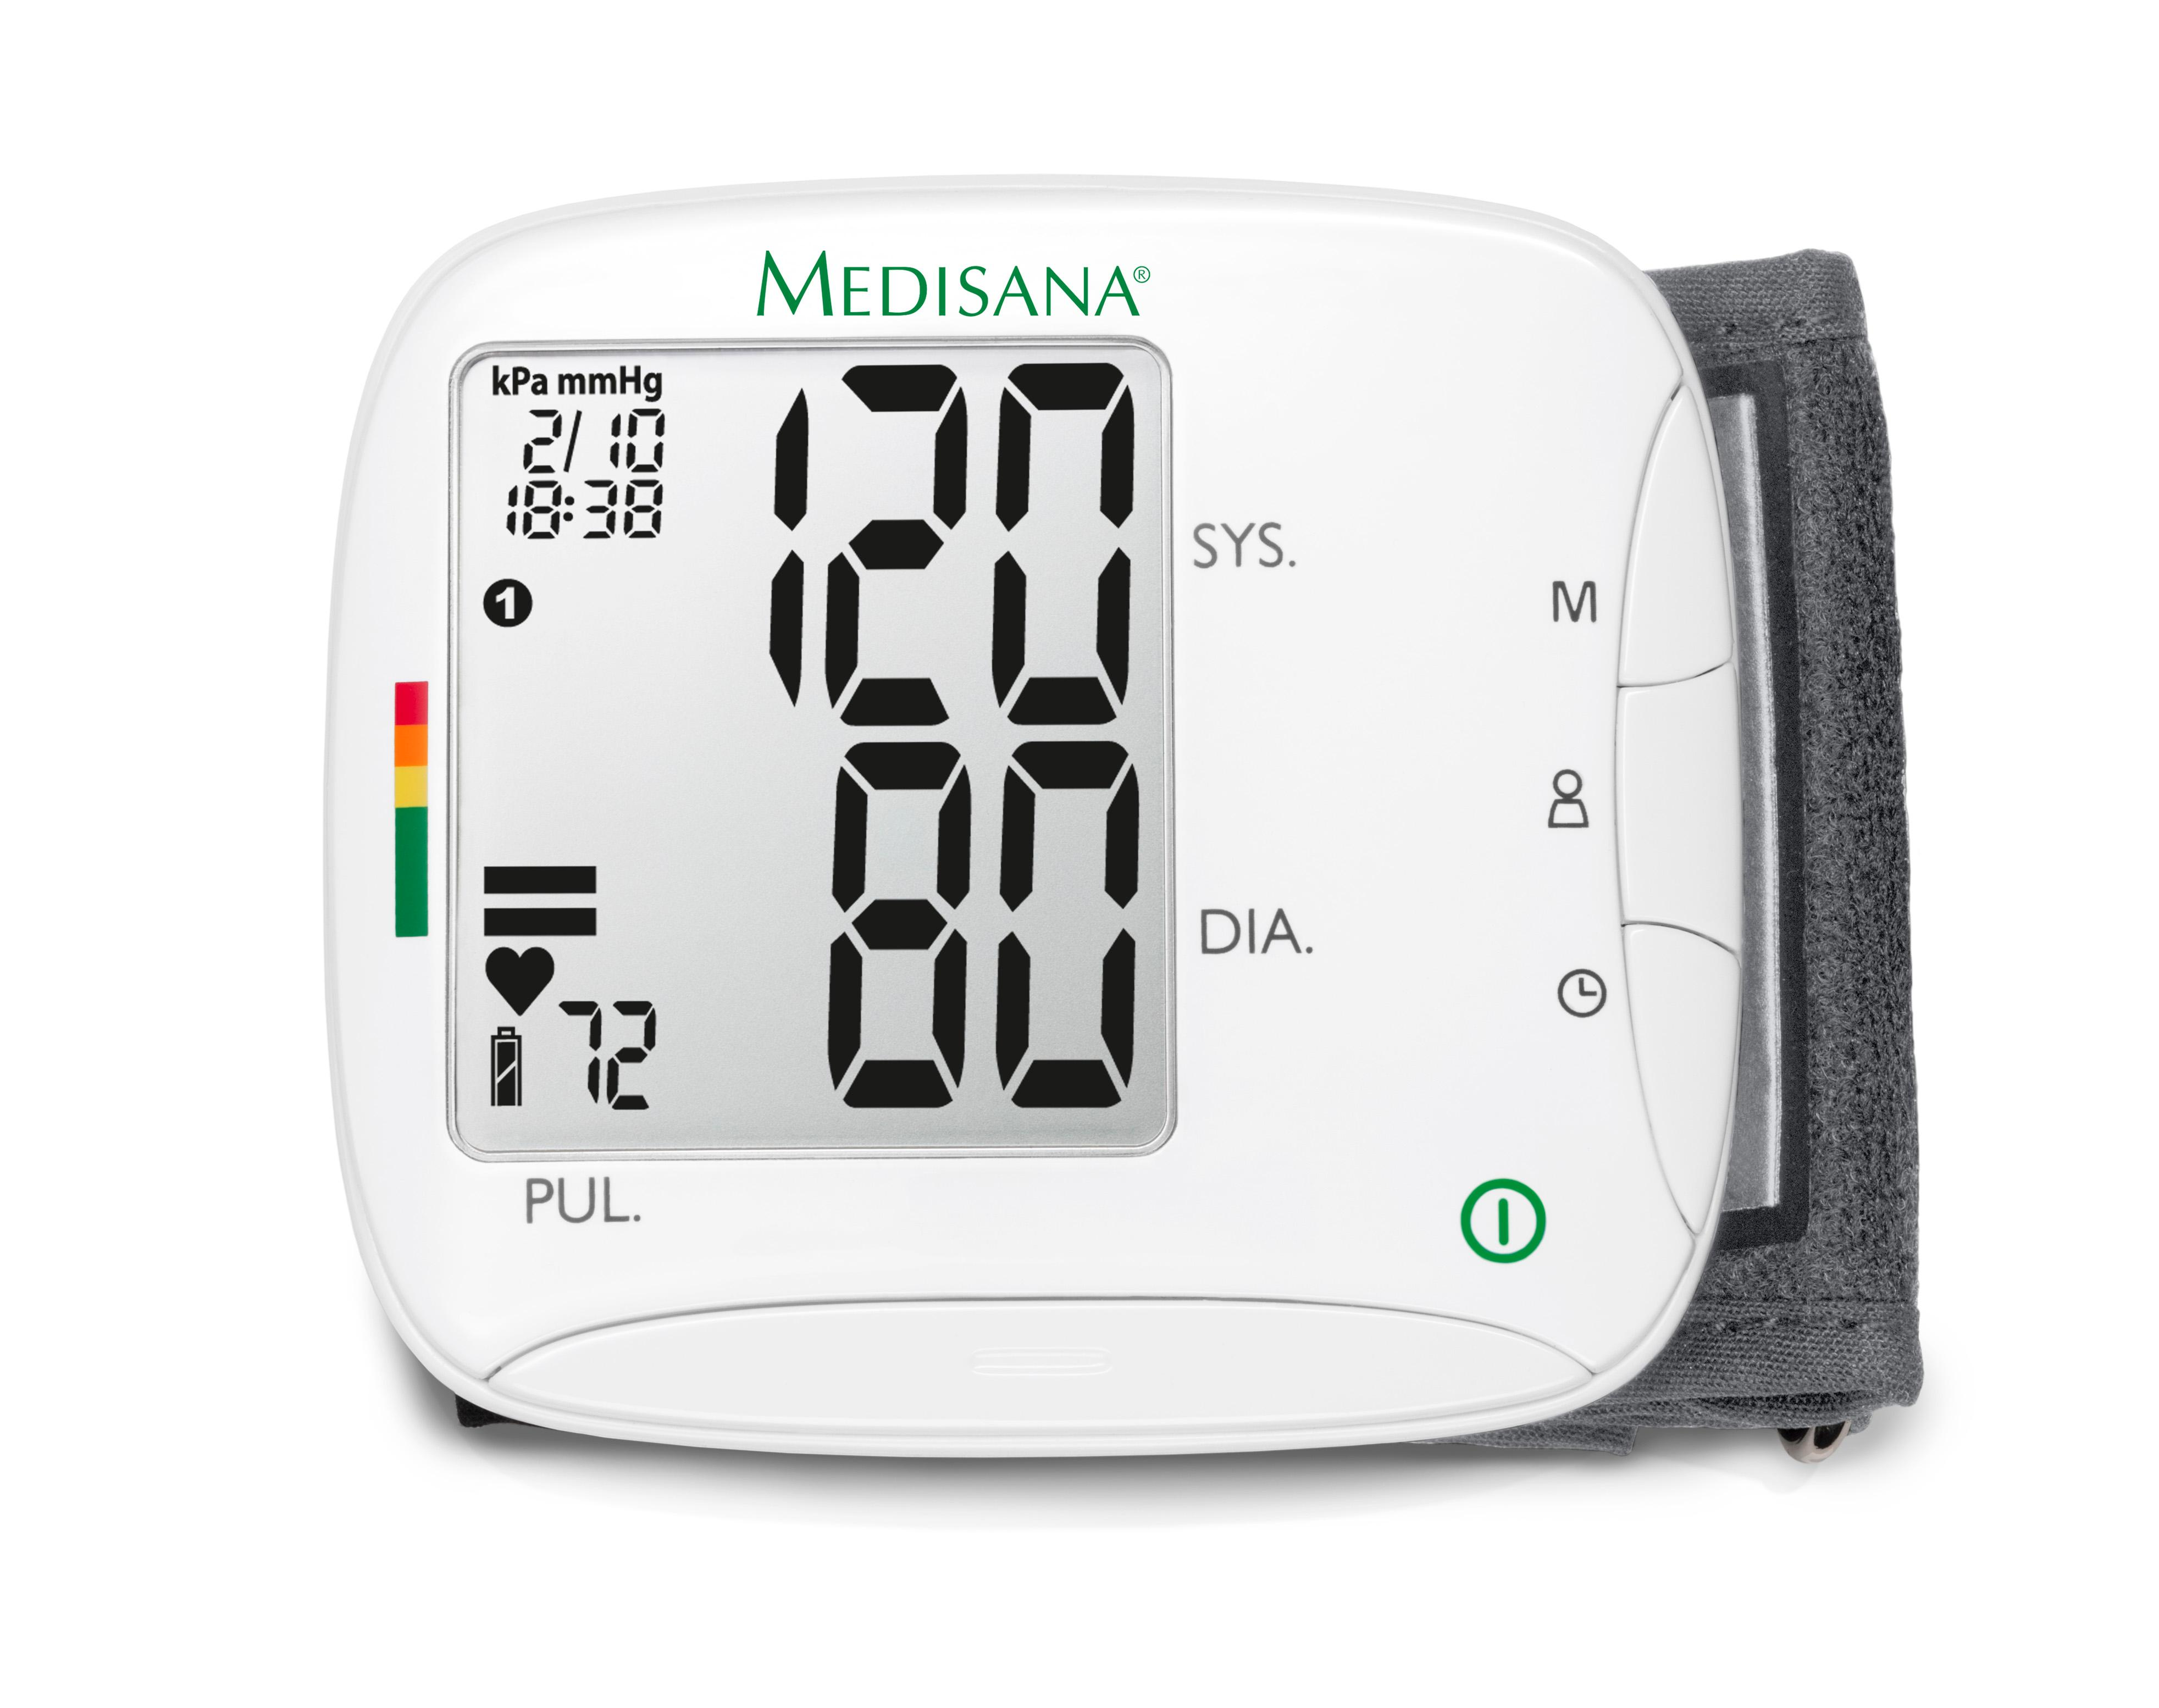 medisana wrist blood pressure monitor instructions